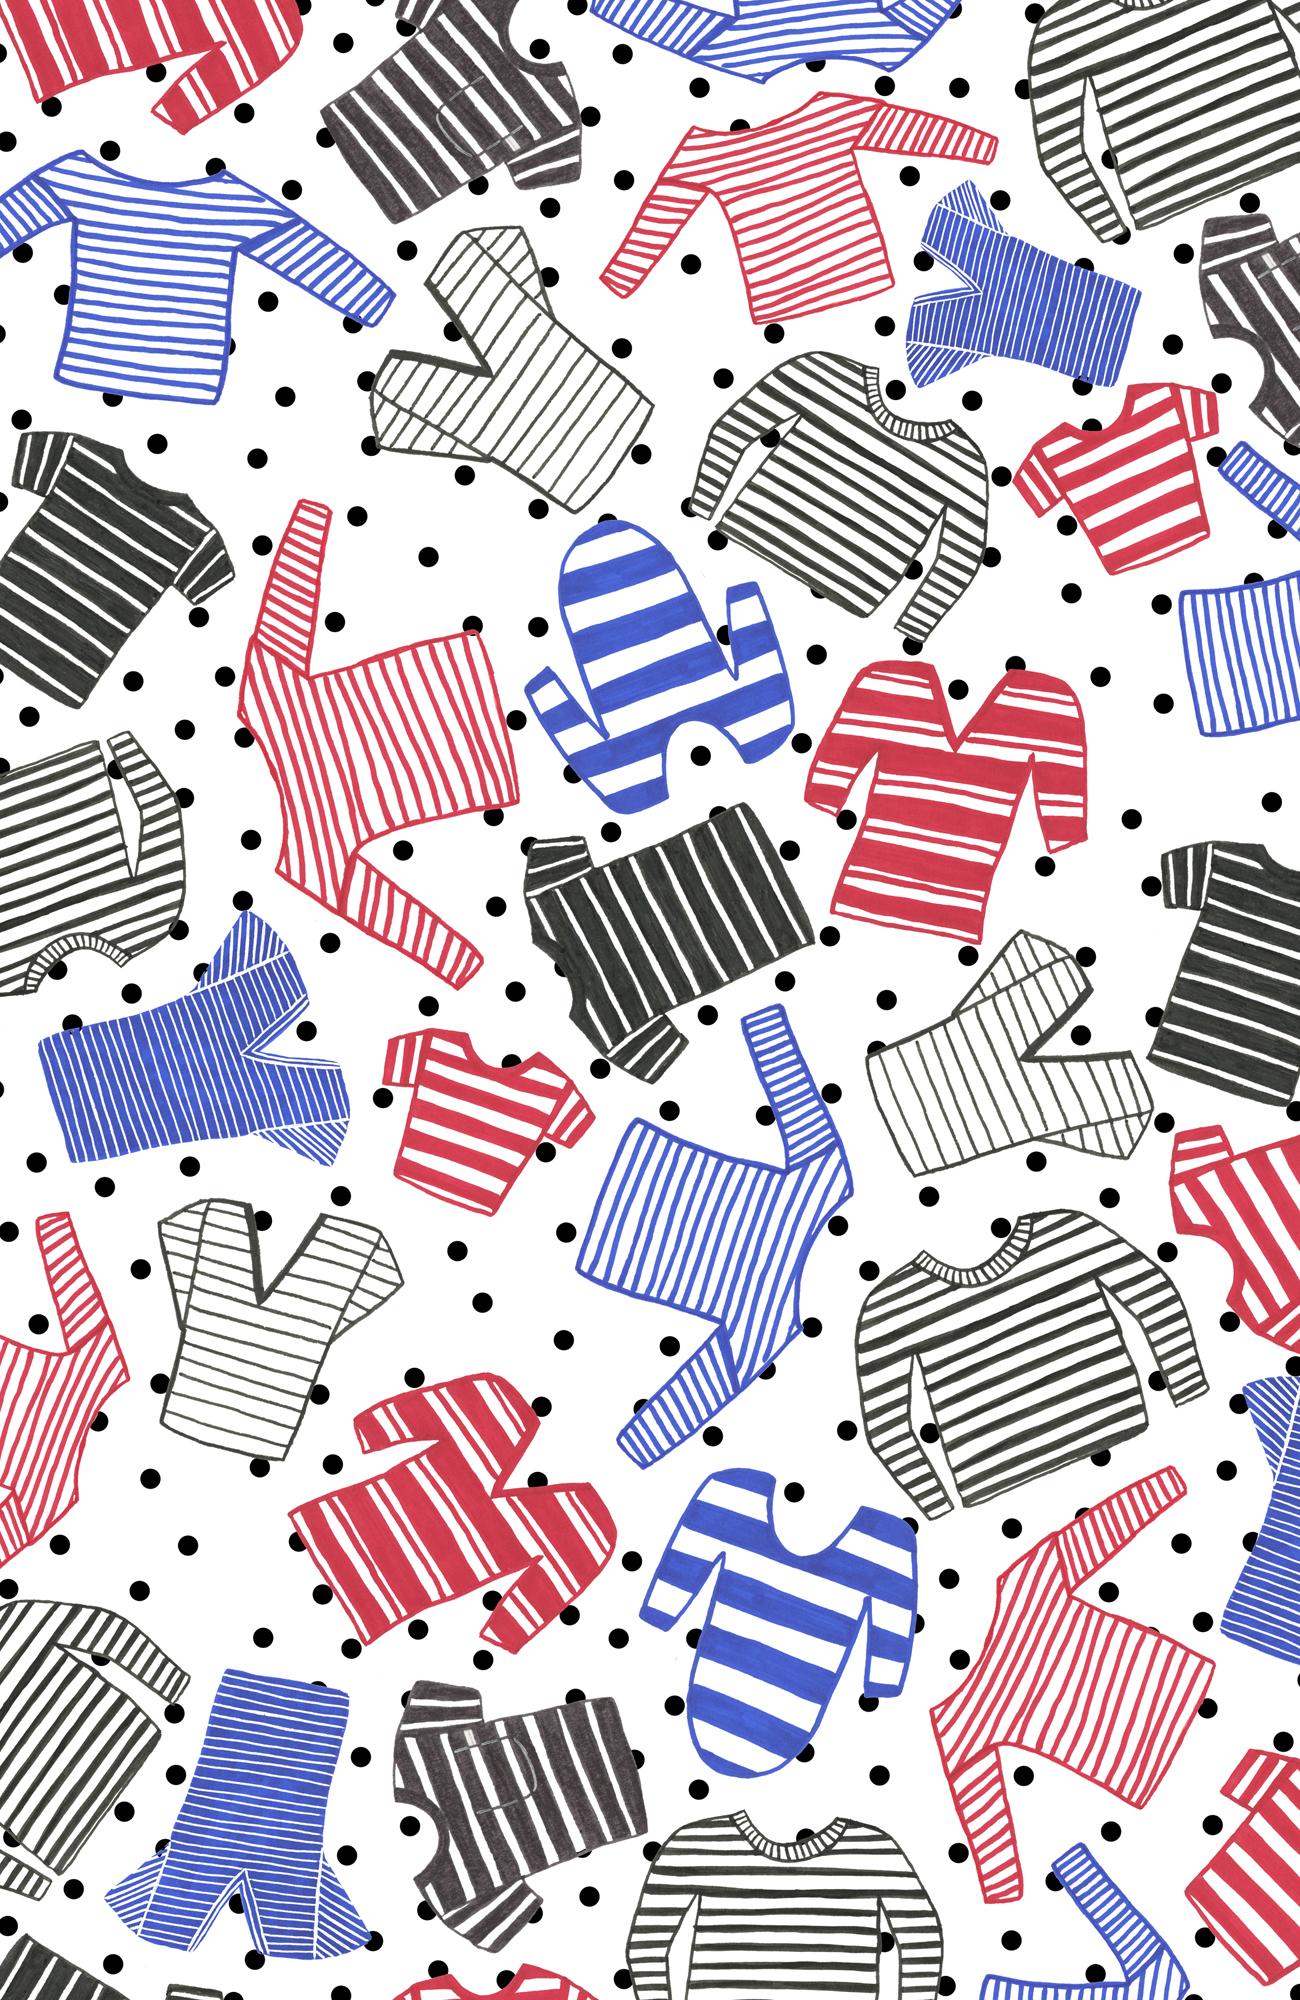 Striped Shirts Pattern Big w Polkas S6 iPhone.jpg